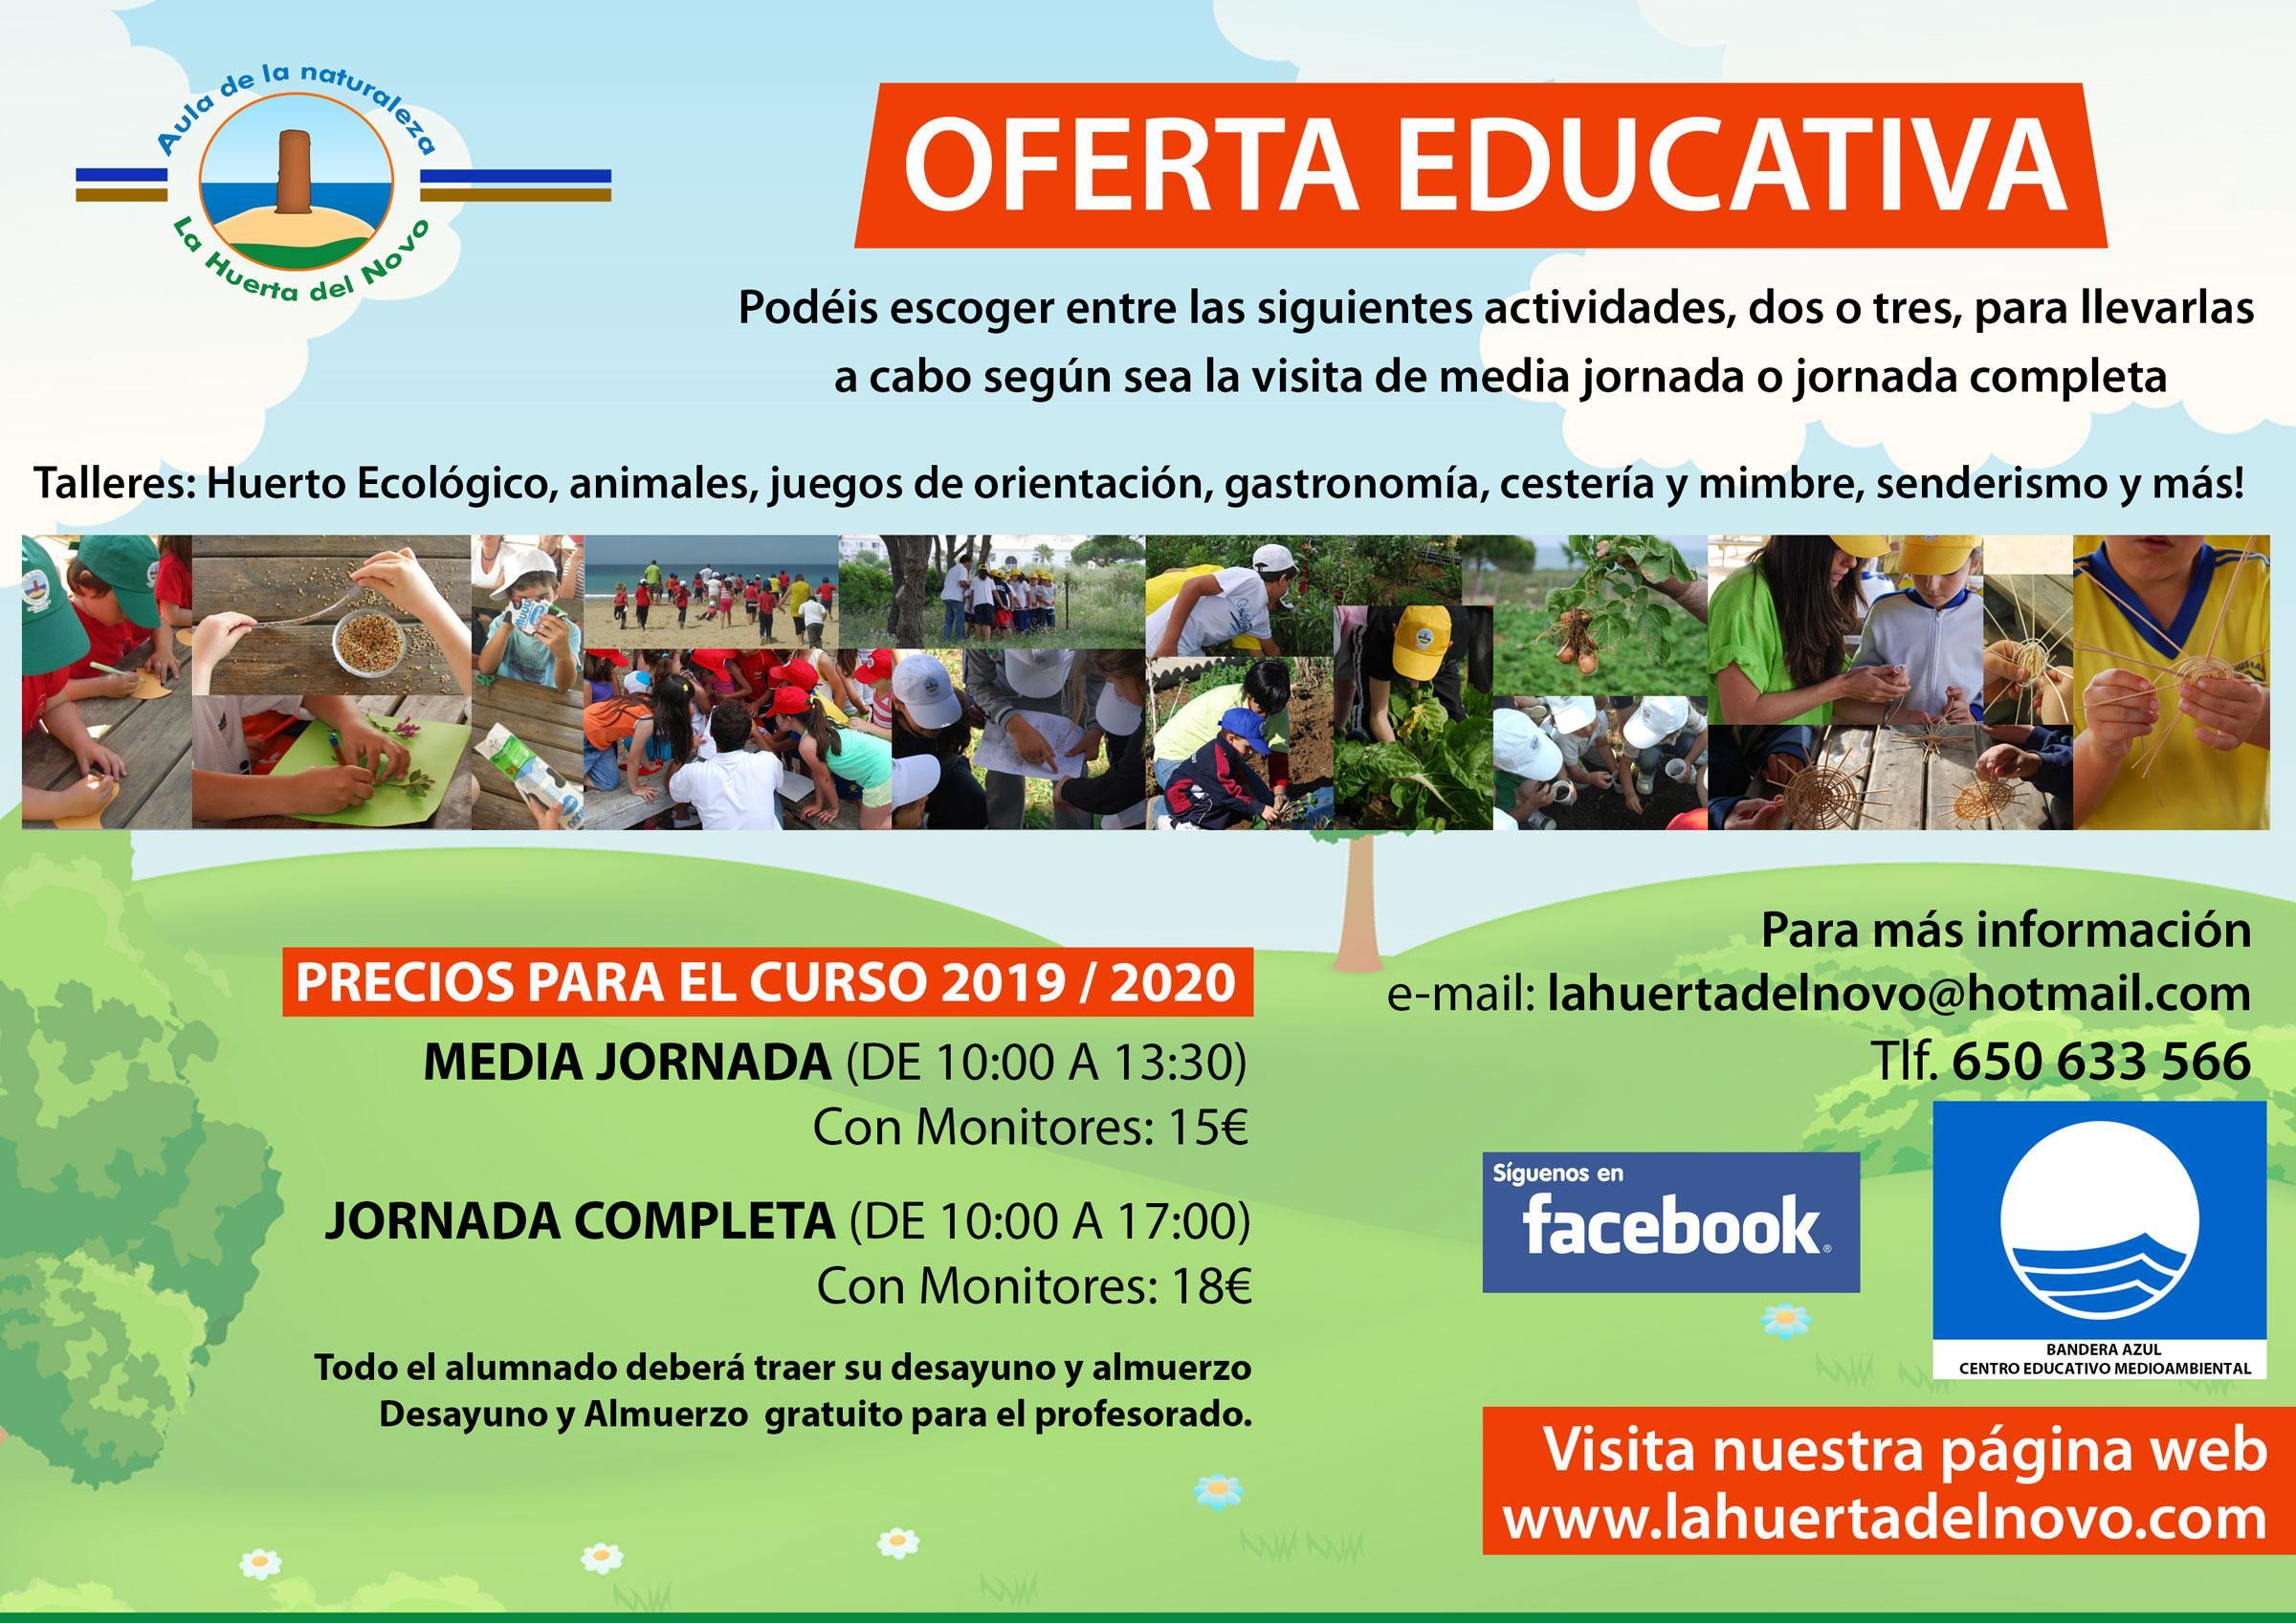 Colegio-Poster-La-Huerta-del-Novo